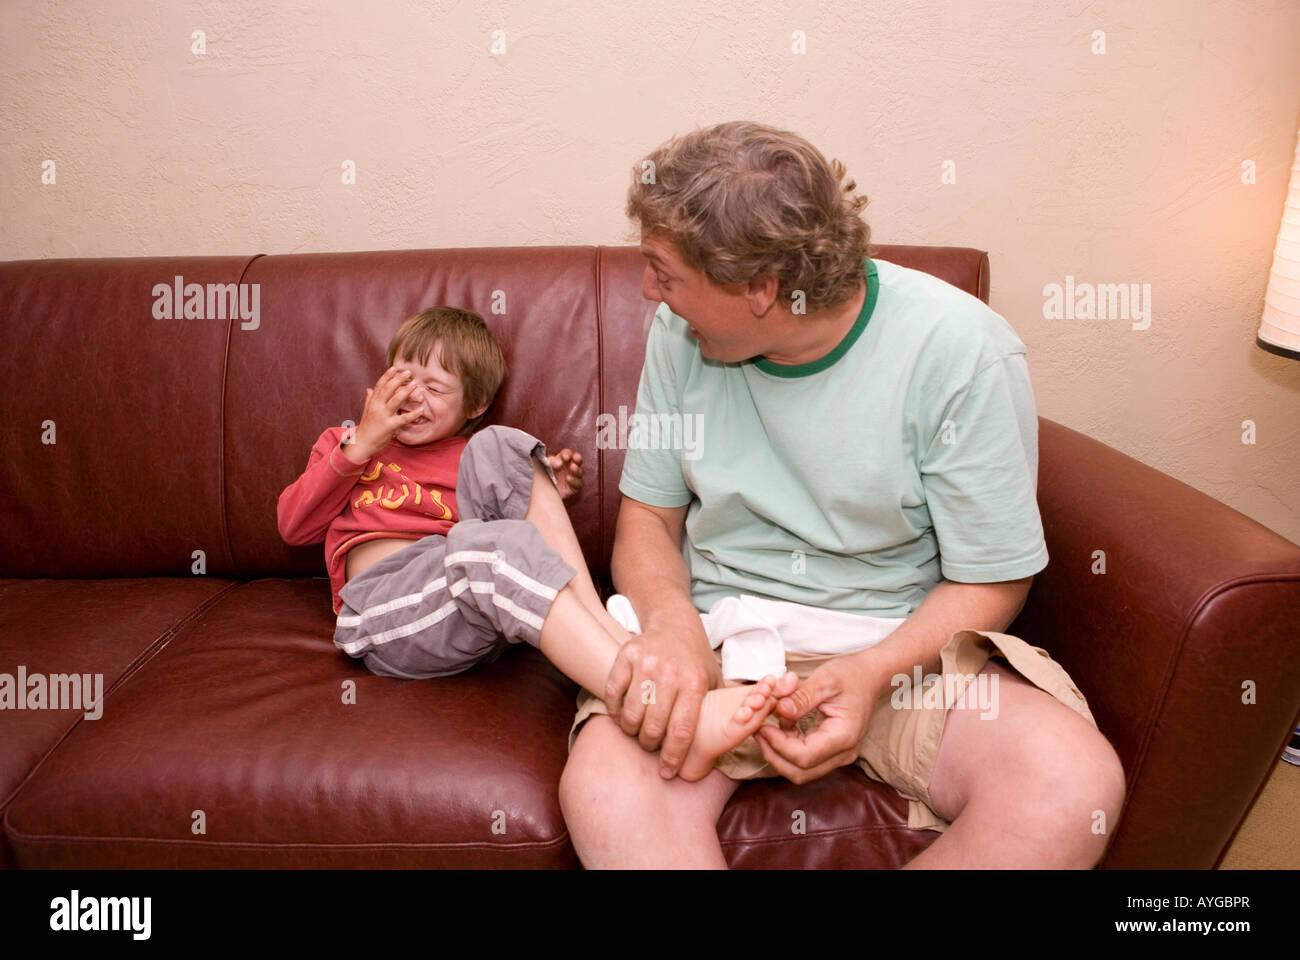 Samus Feet Tickle: Tickle Feet Stock Photos & Tickle Feet Stock Images